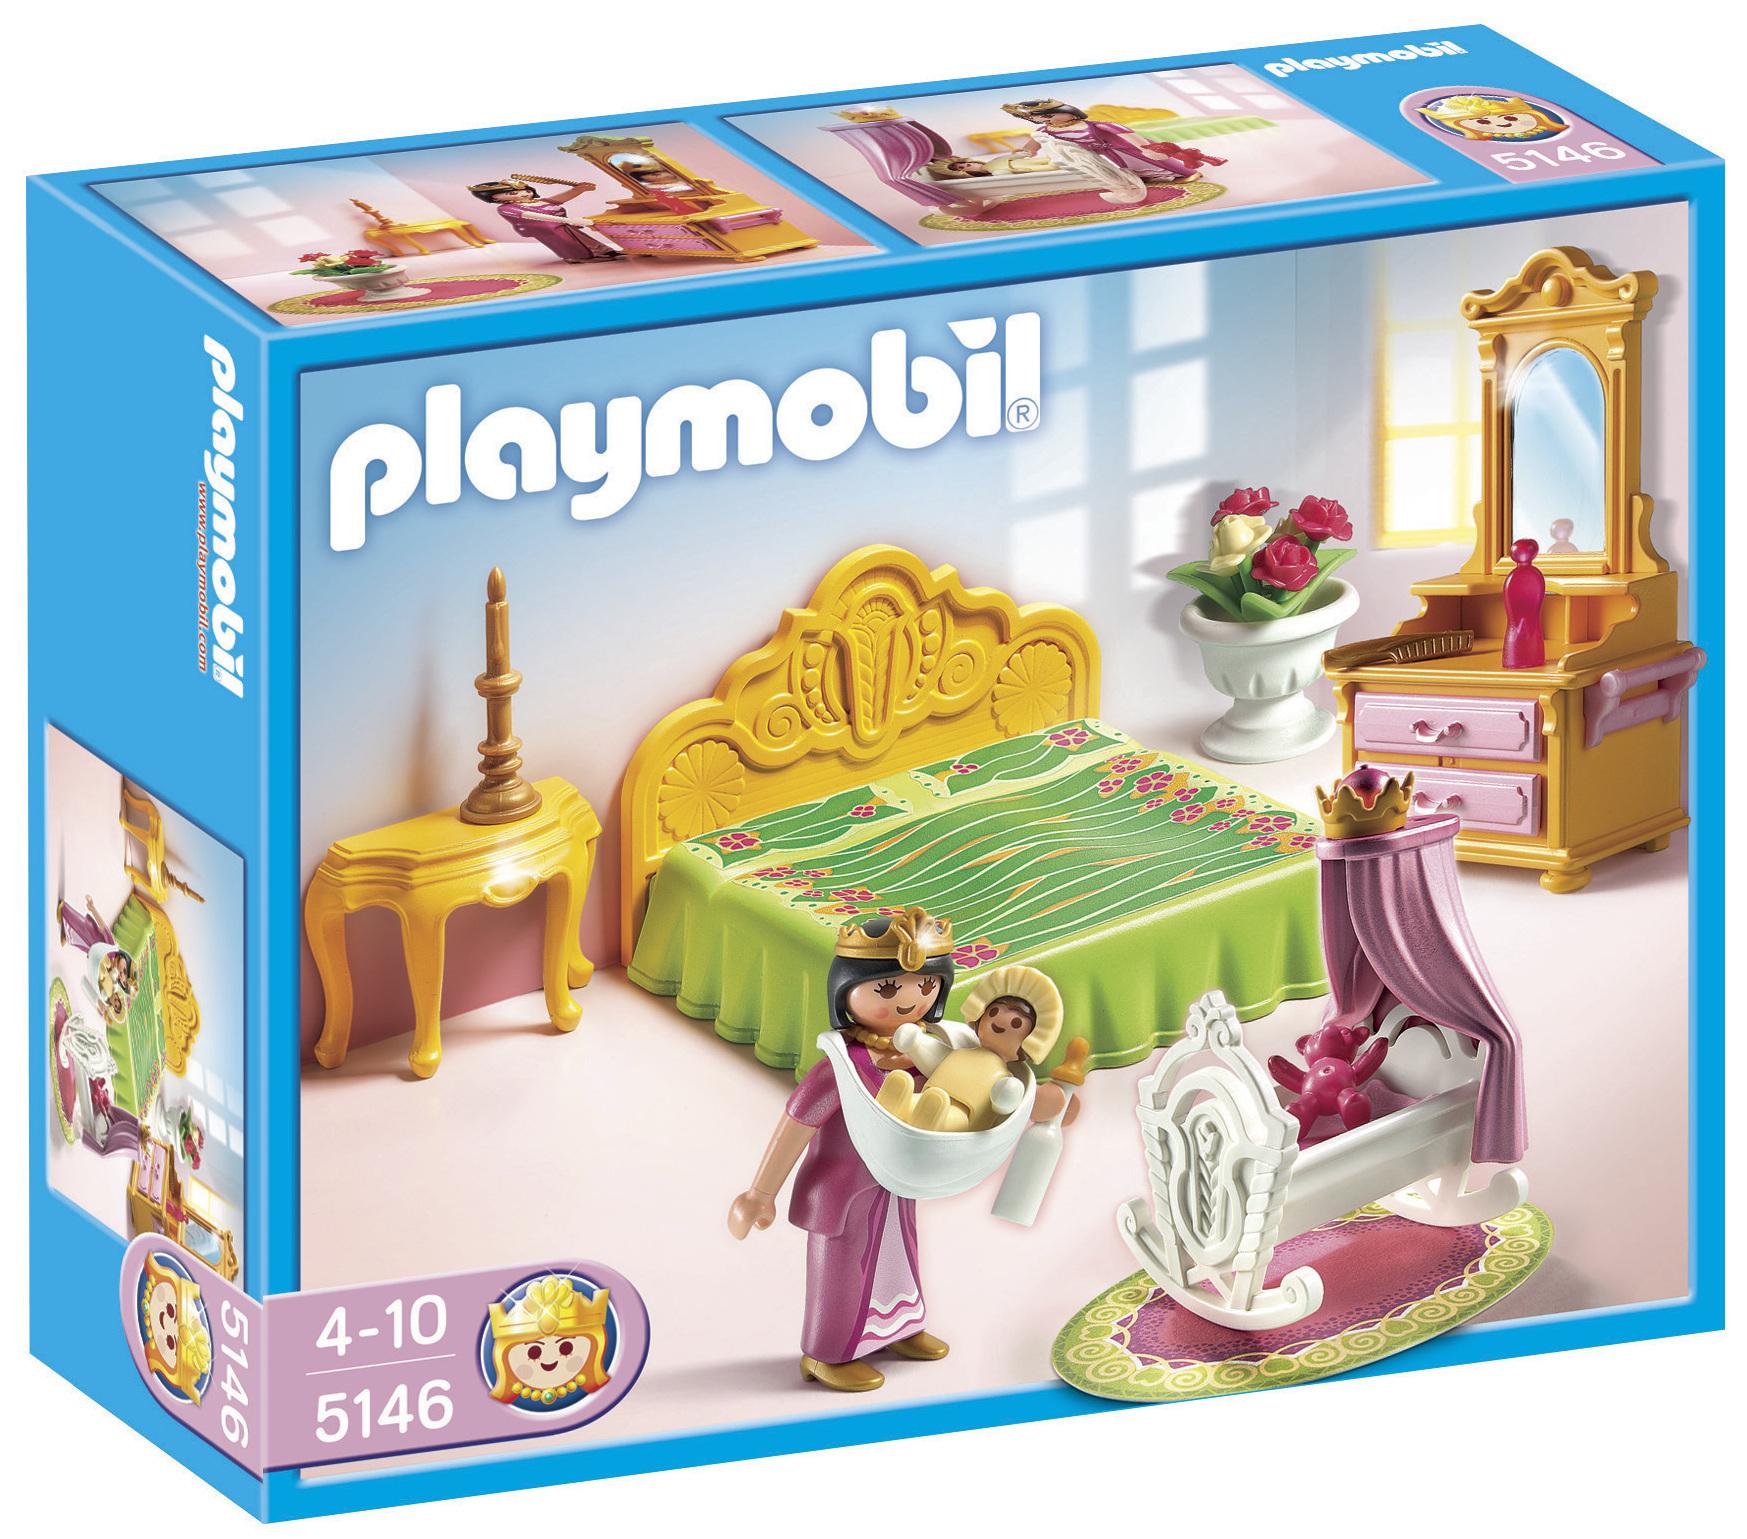 Chambre de la reine - Playmobil 5146